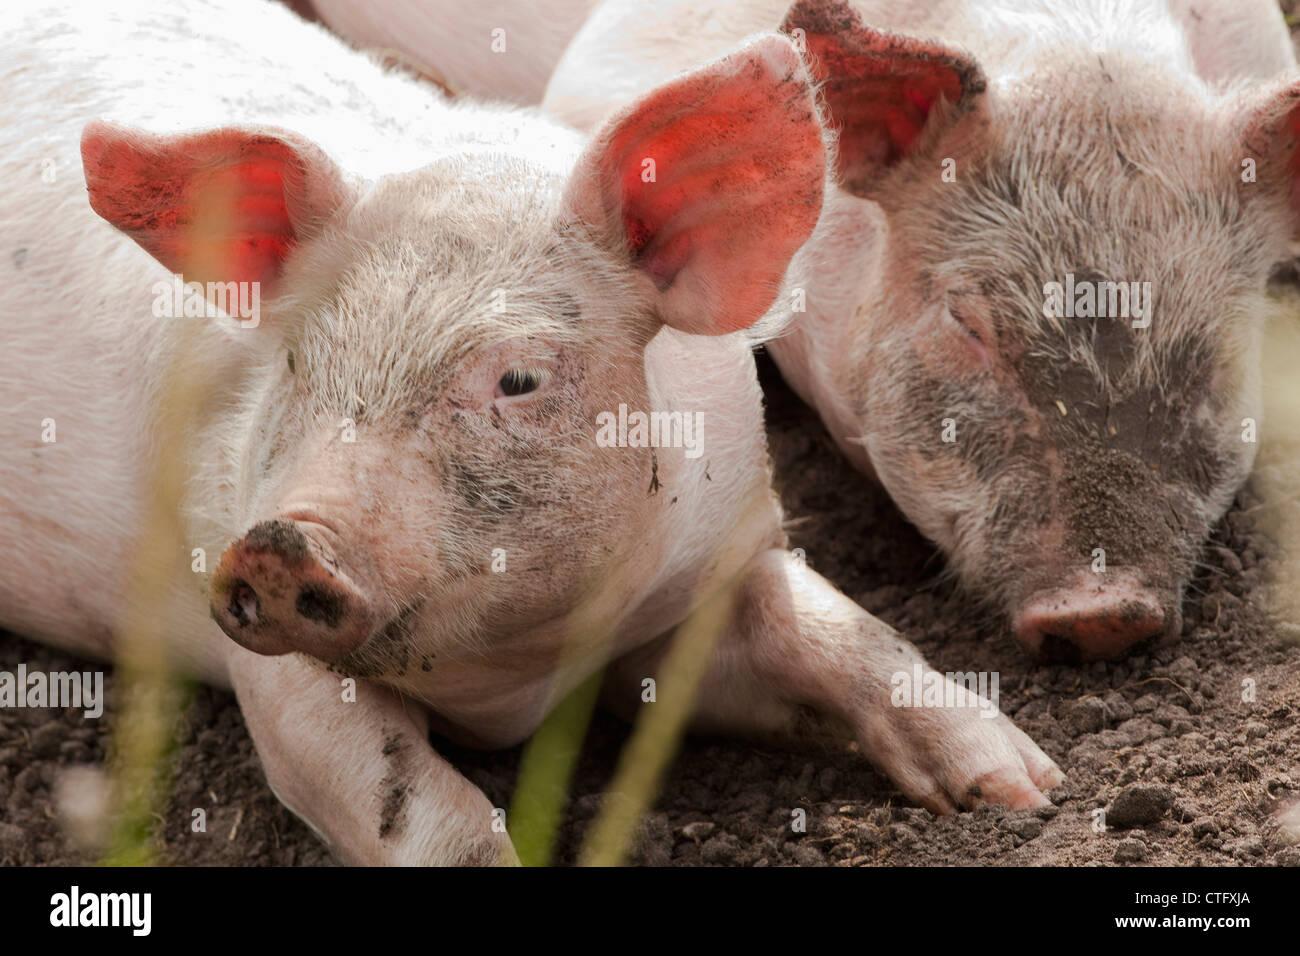 The Netherlands, Kortenhoef, Piglets. - Stock Image